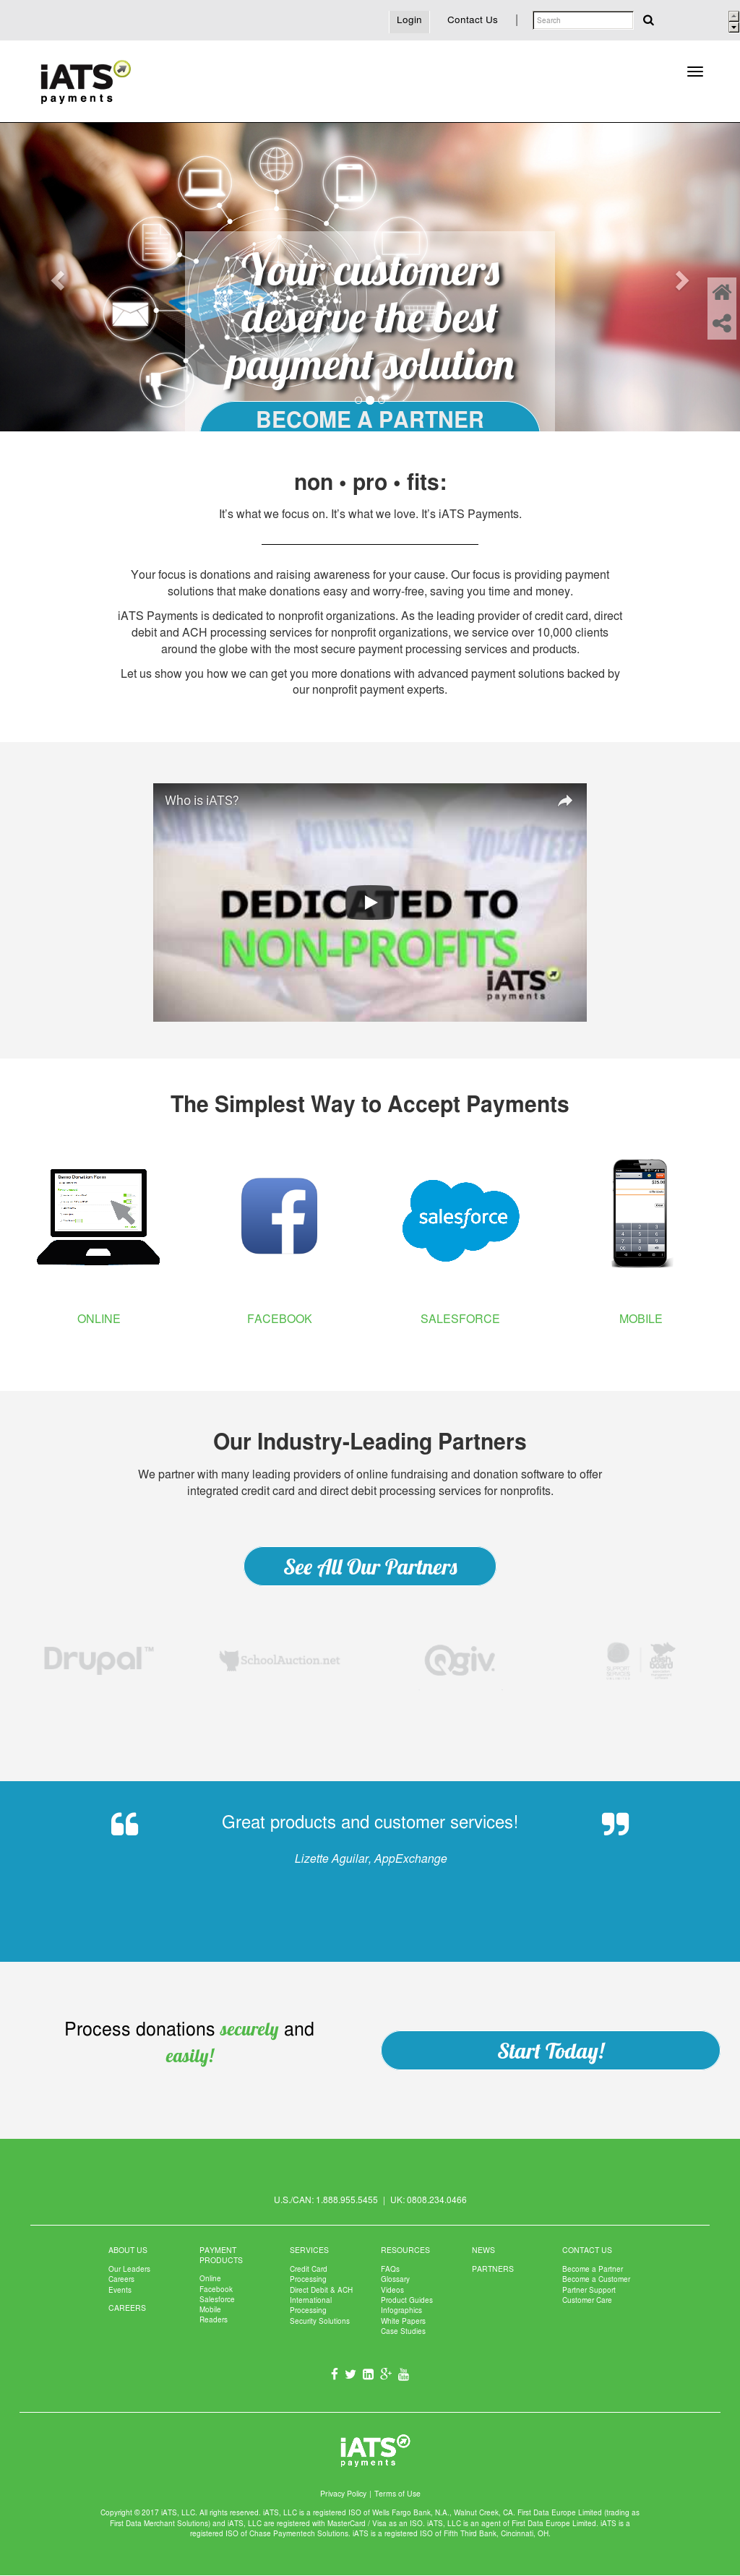 IATS Competitors, Revenue and Employees - Owler Company Profile